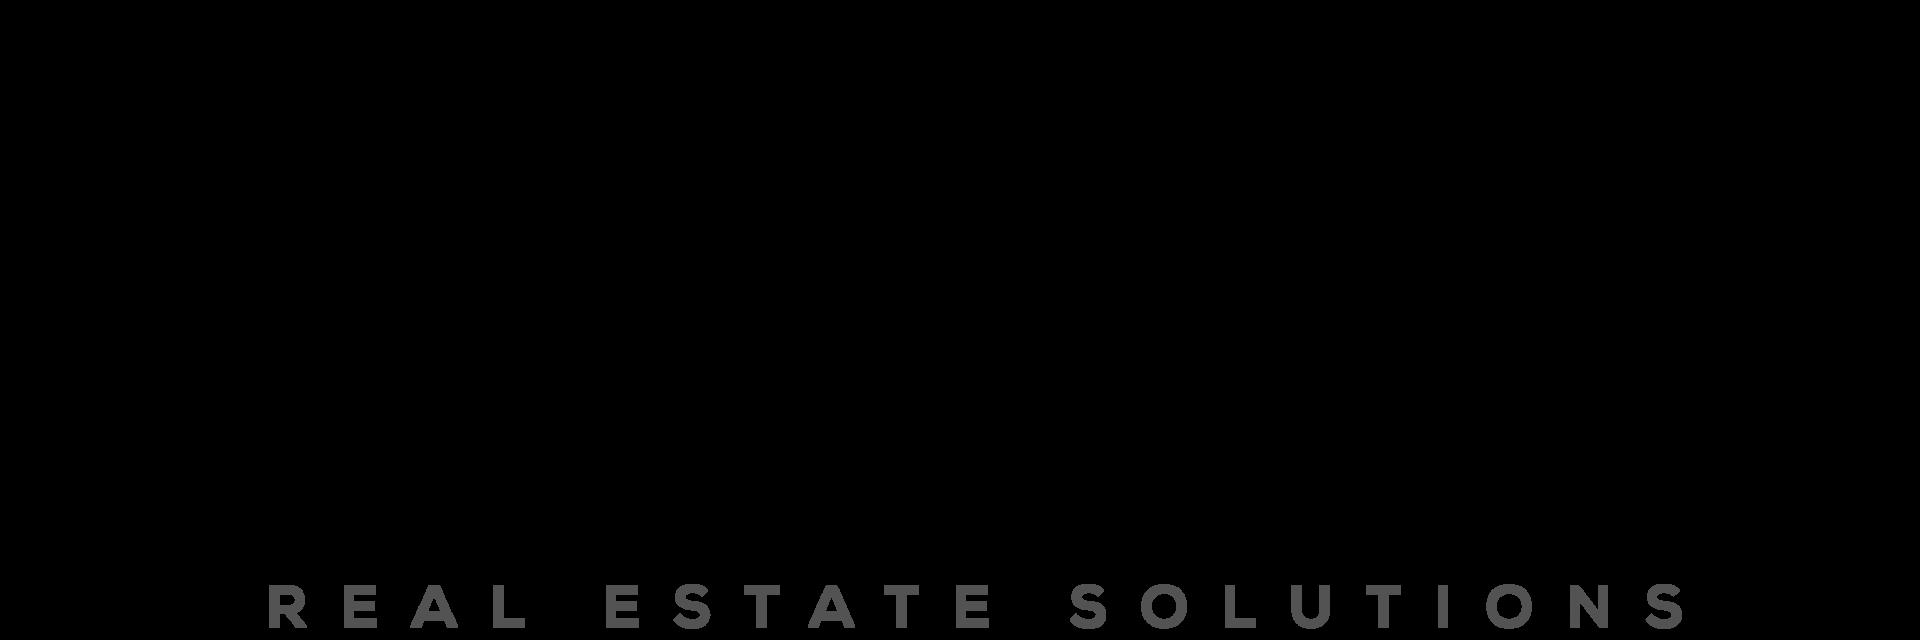 Rent To Own Homes Atlanta GA logo